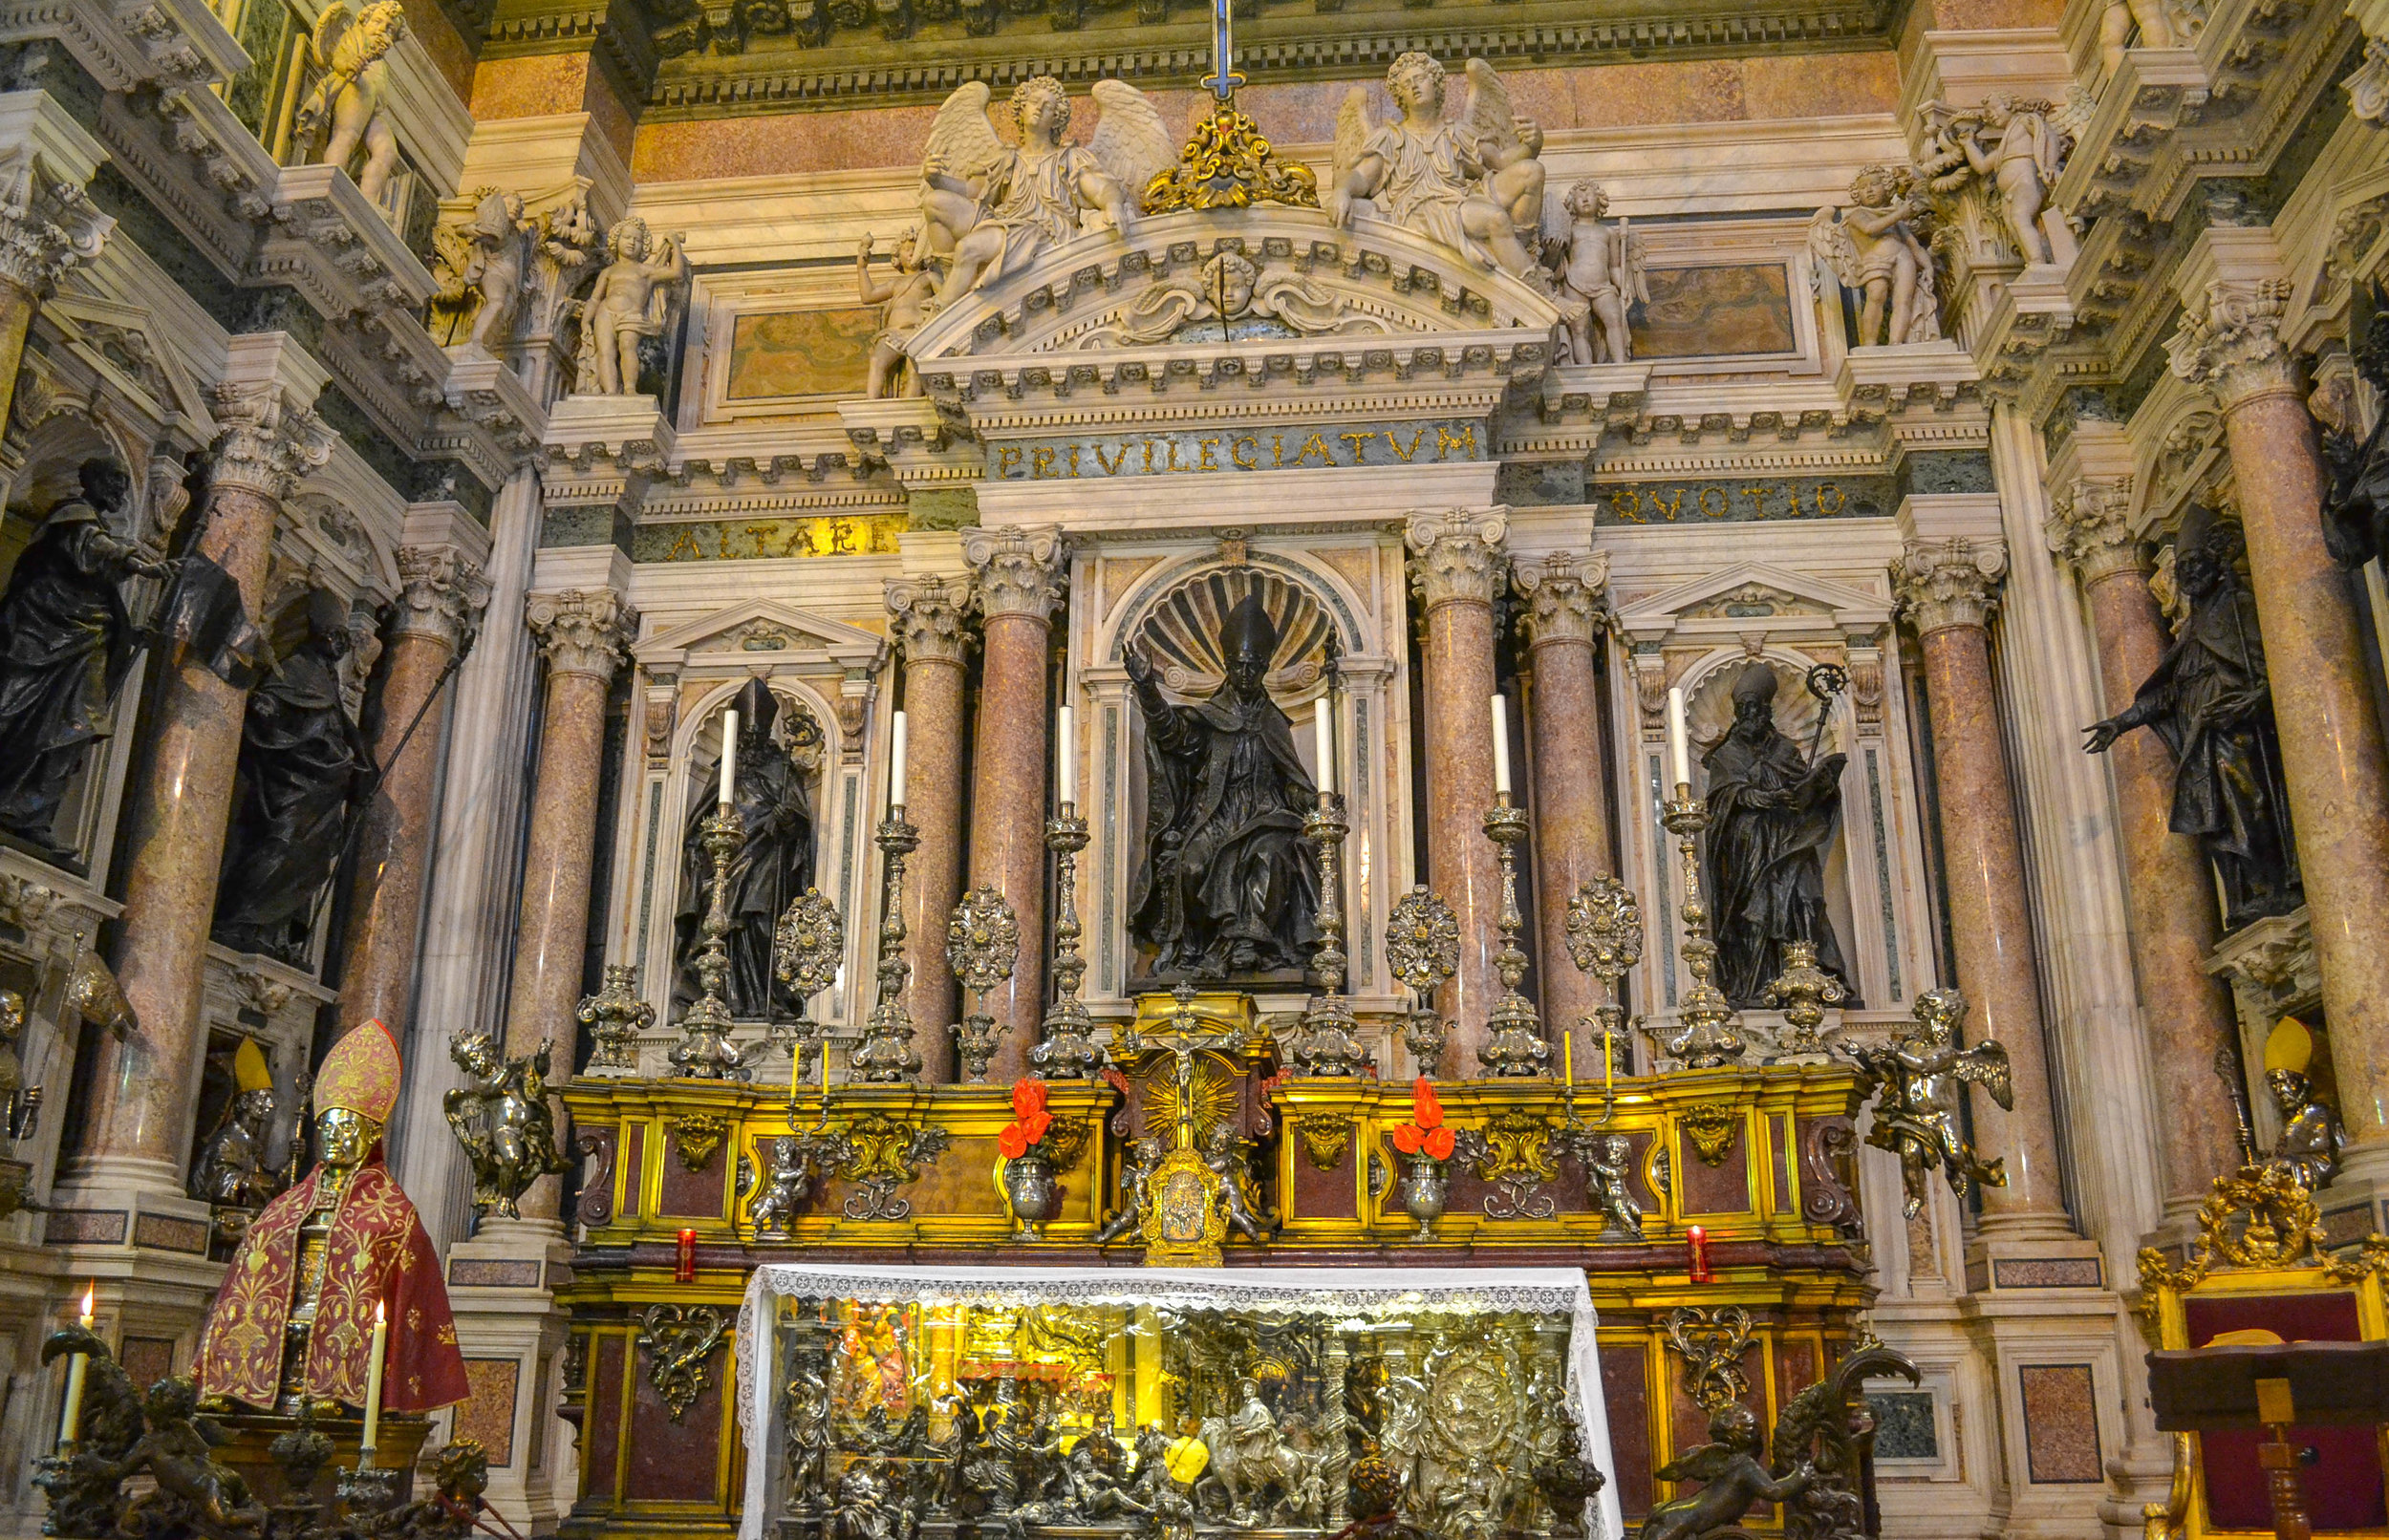 Royal Chapel of the Treasure of St. Januarius